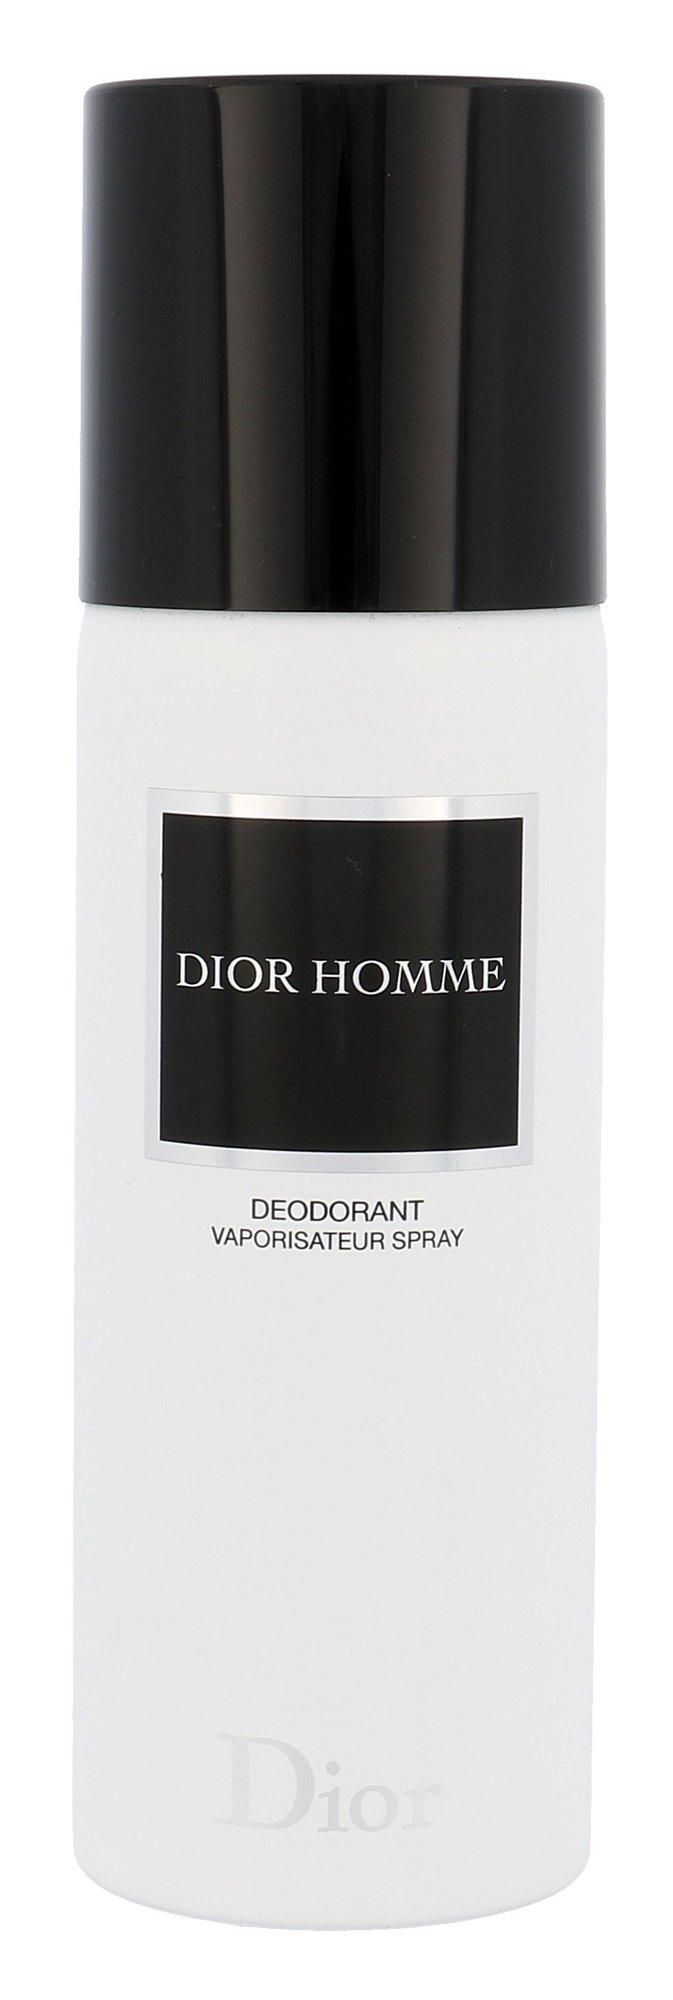 Christian Dior Dior Homme Deodorant 150ml